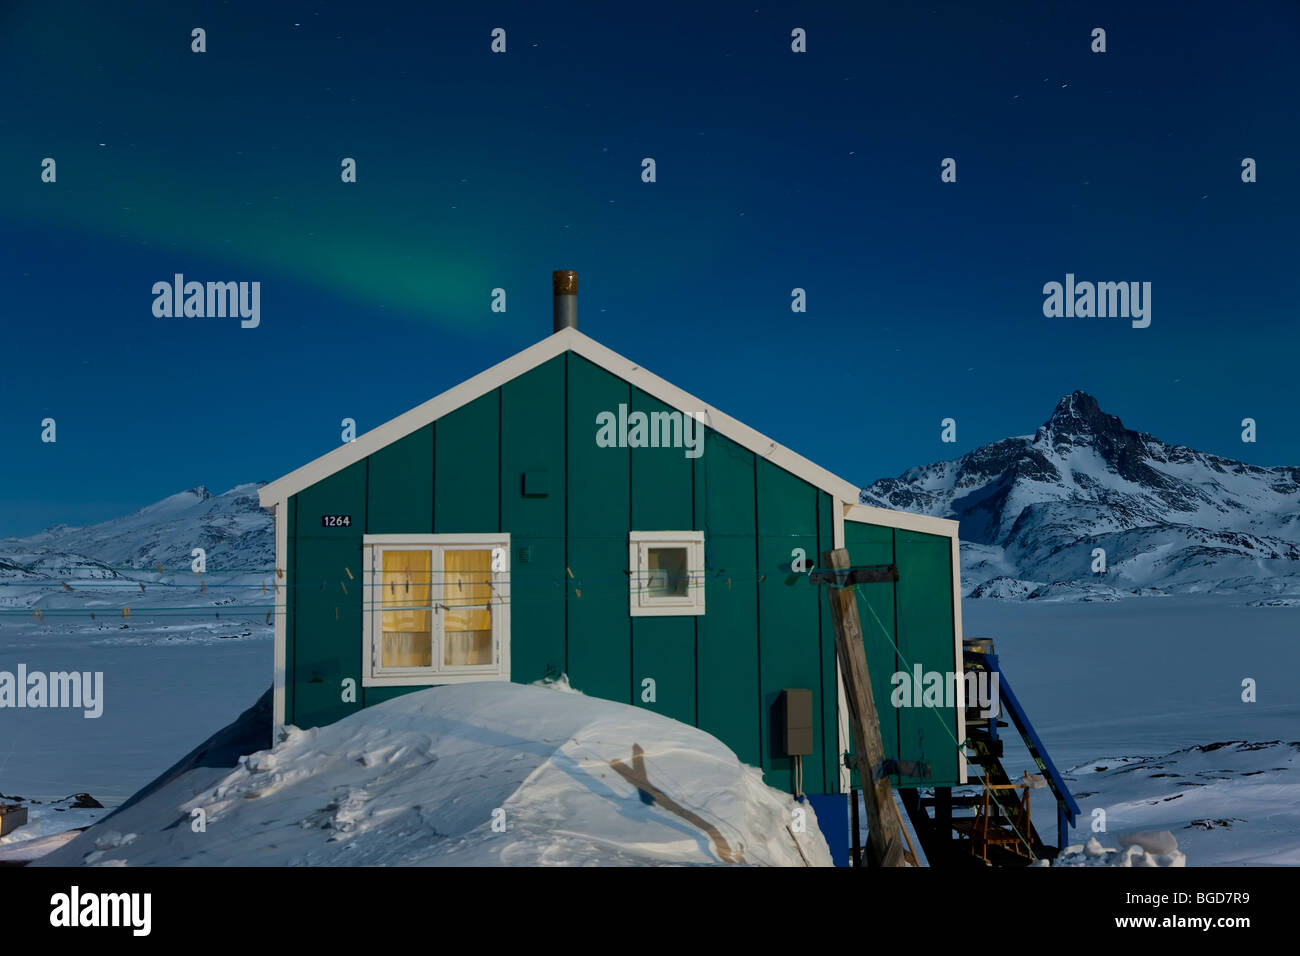 Aurora Borealis or Northern Polar Lights, Tasiilaq, E. Greenland - Stock Image